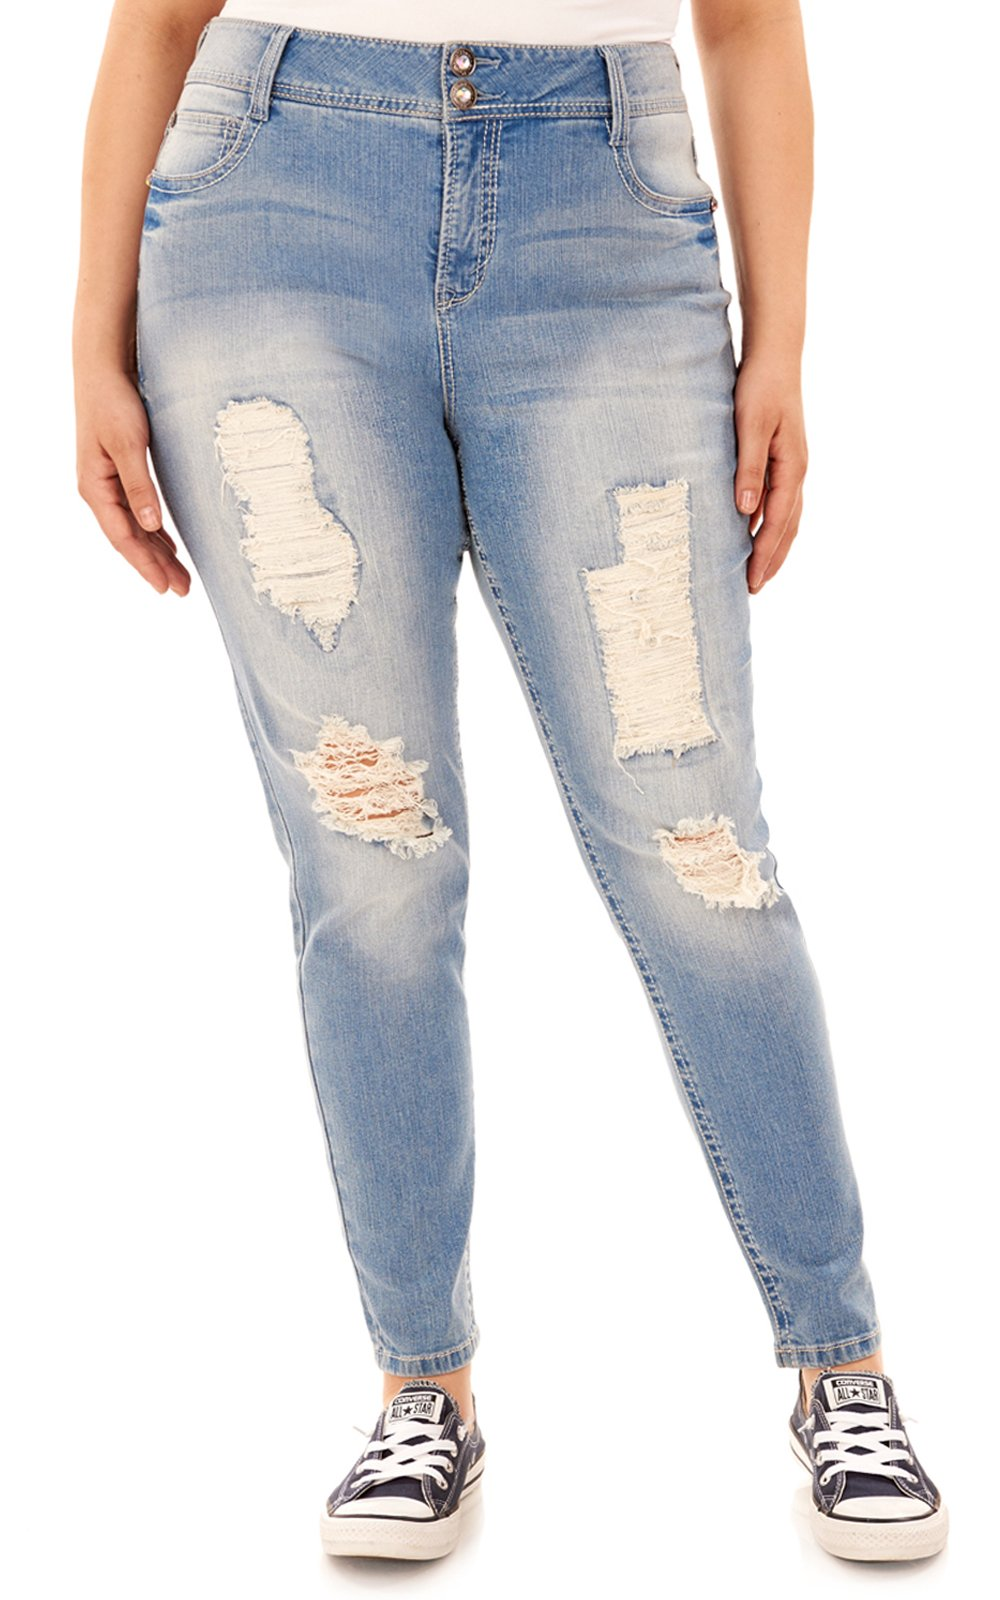 WallFlower Plus Size Luscious Curvy Bling Bootcut Jeans in Fern, 20 Plus